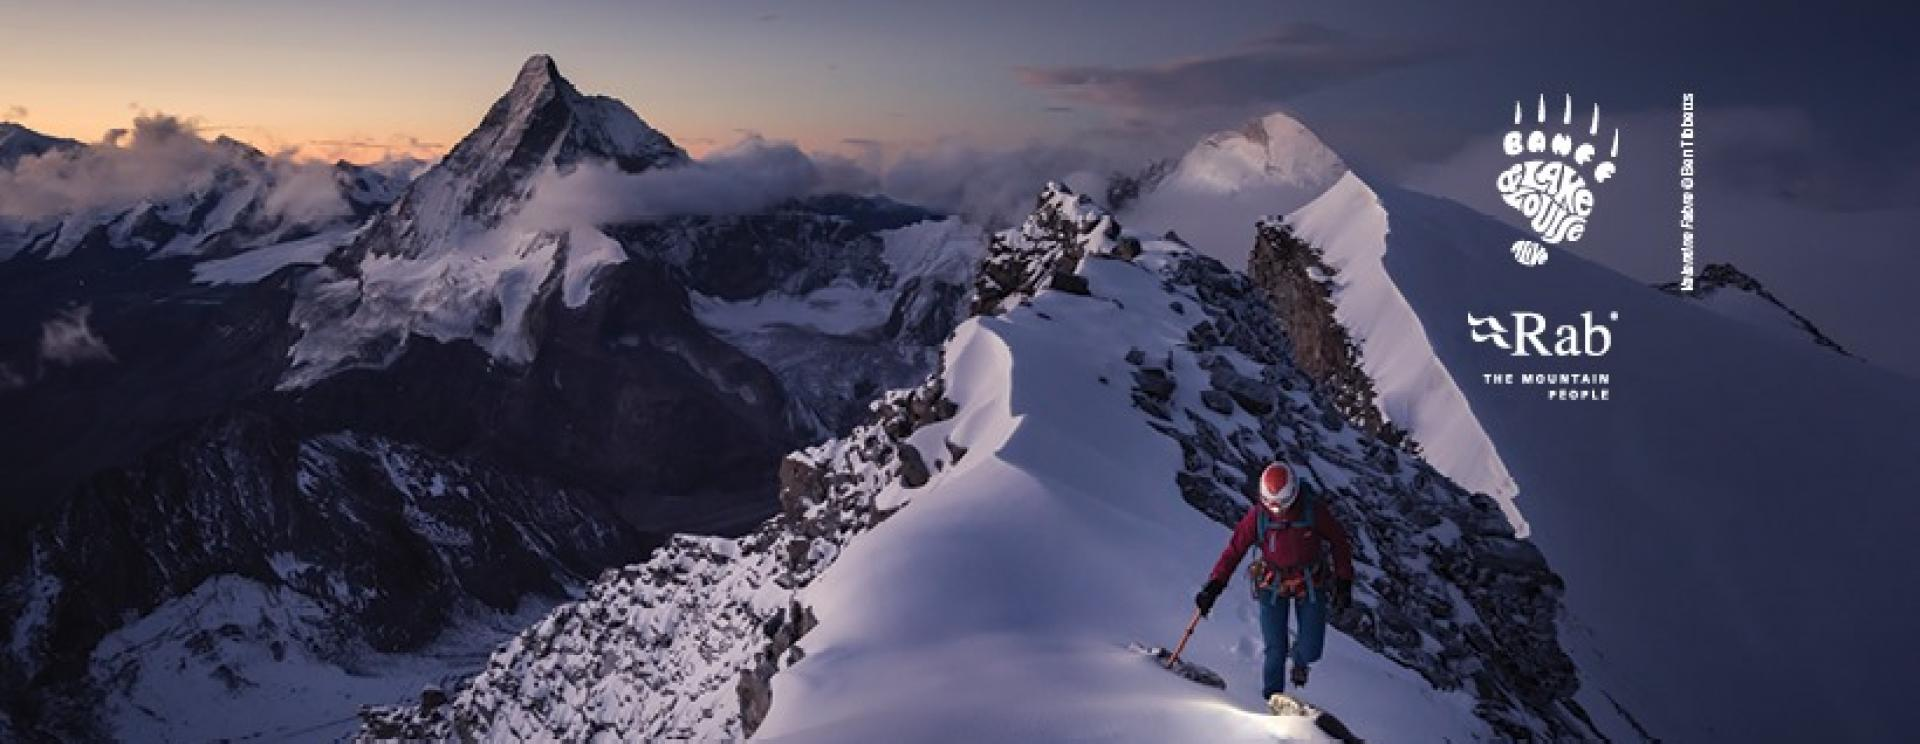 Banff Mountain Film Festival World Tour — CANCELLED